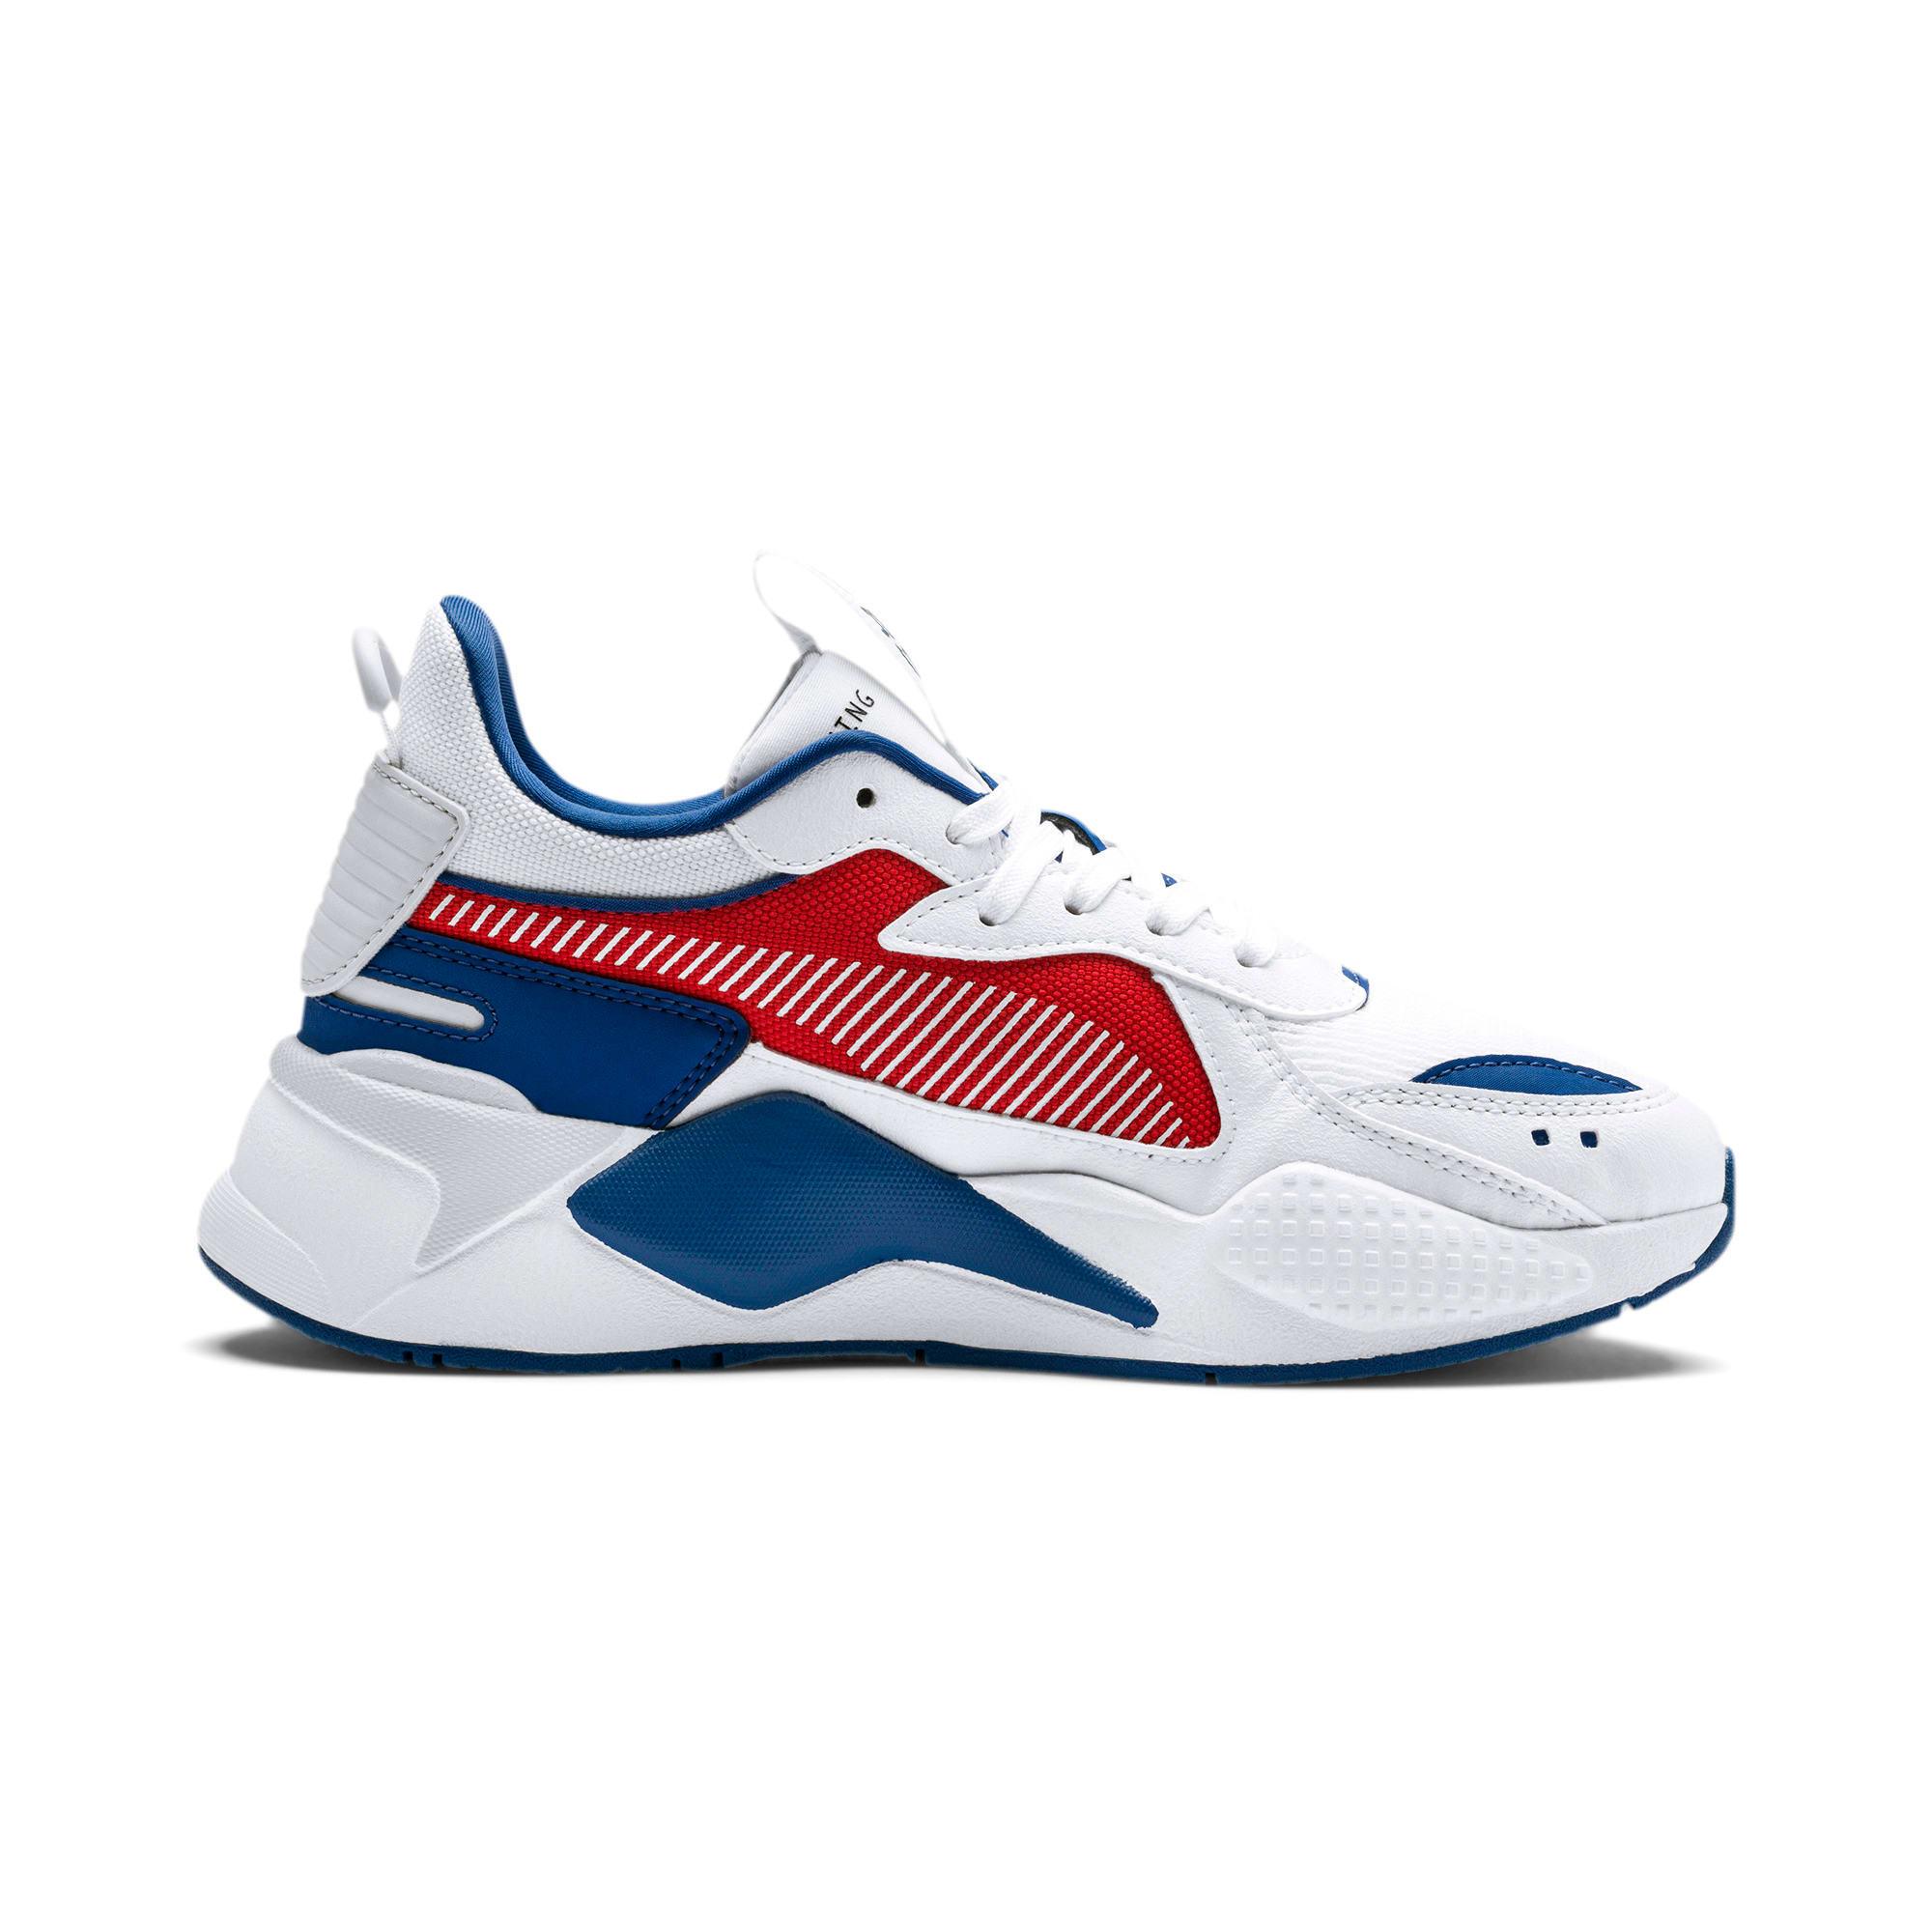 Thumbnail 5 of RS-X Hard Drive Sneakers JR, Puma White-High Risk Red, medium